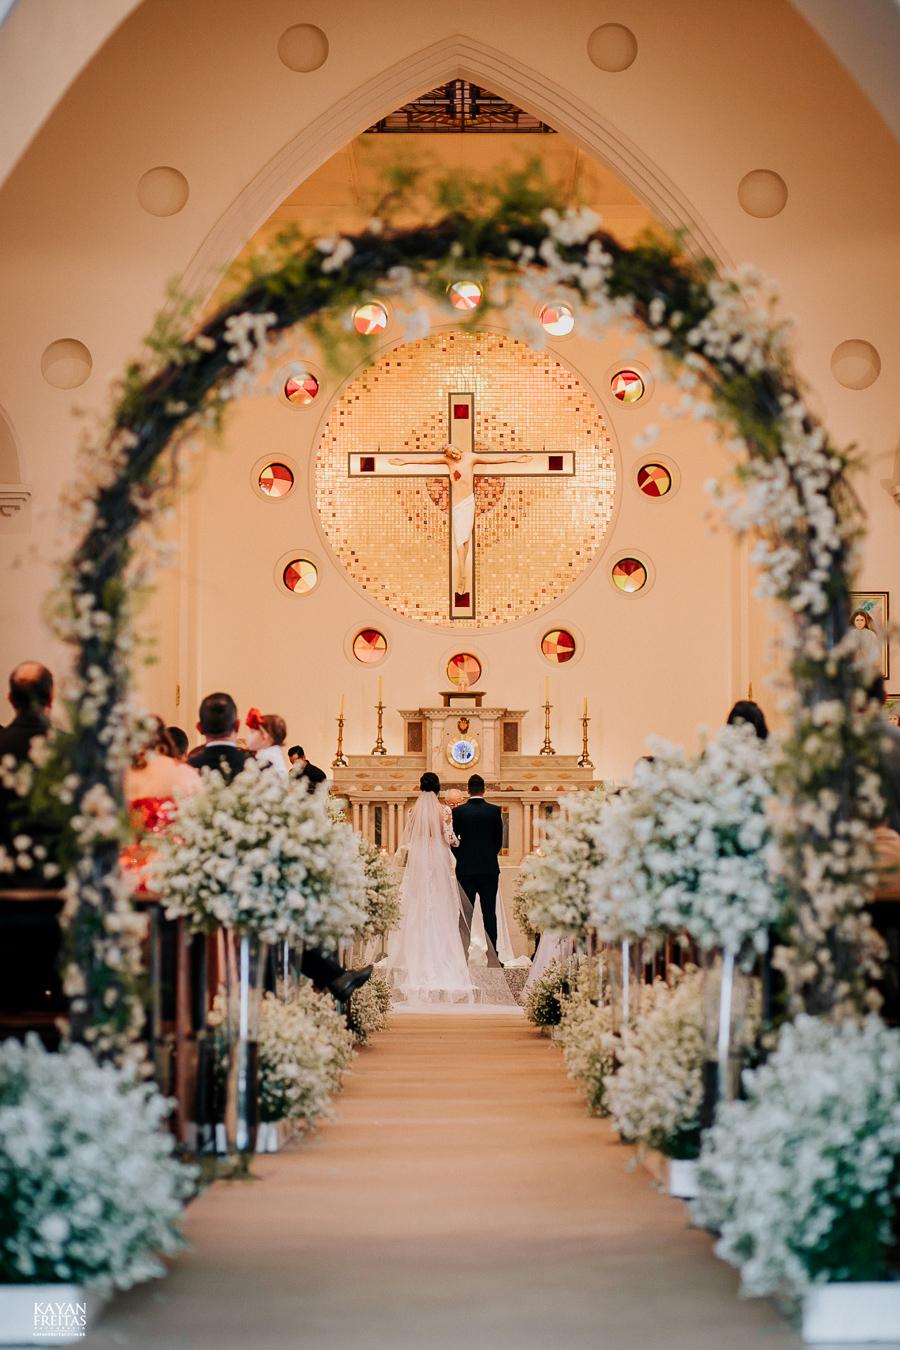 casamento-paularamos-florianopolis-0064 Casamento Cris e Mickael - Paula Ramos Florianópolis